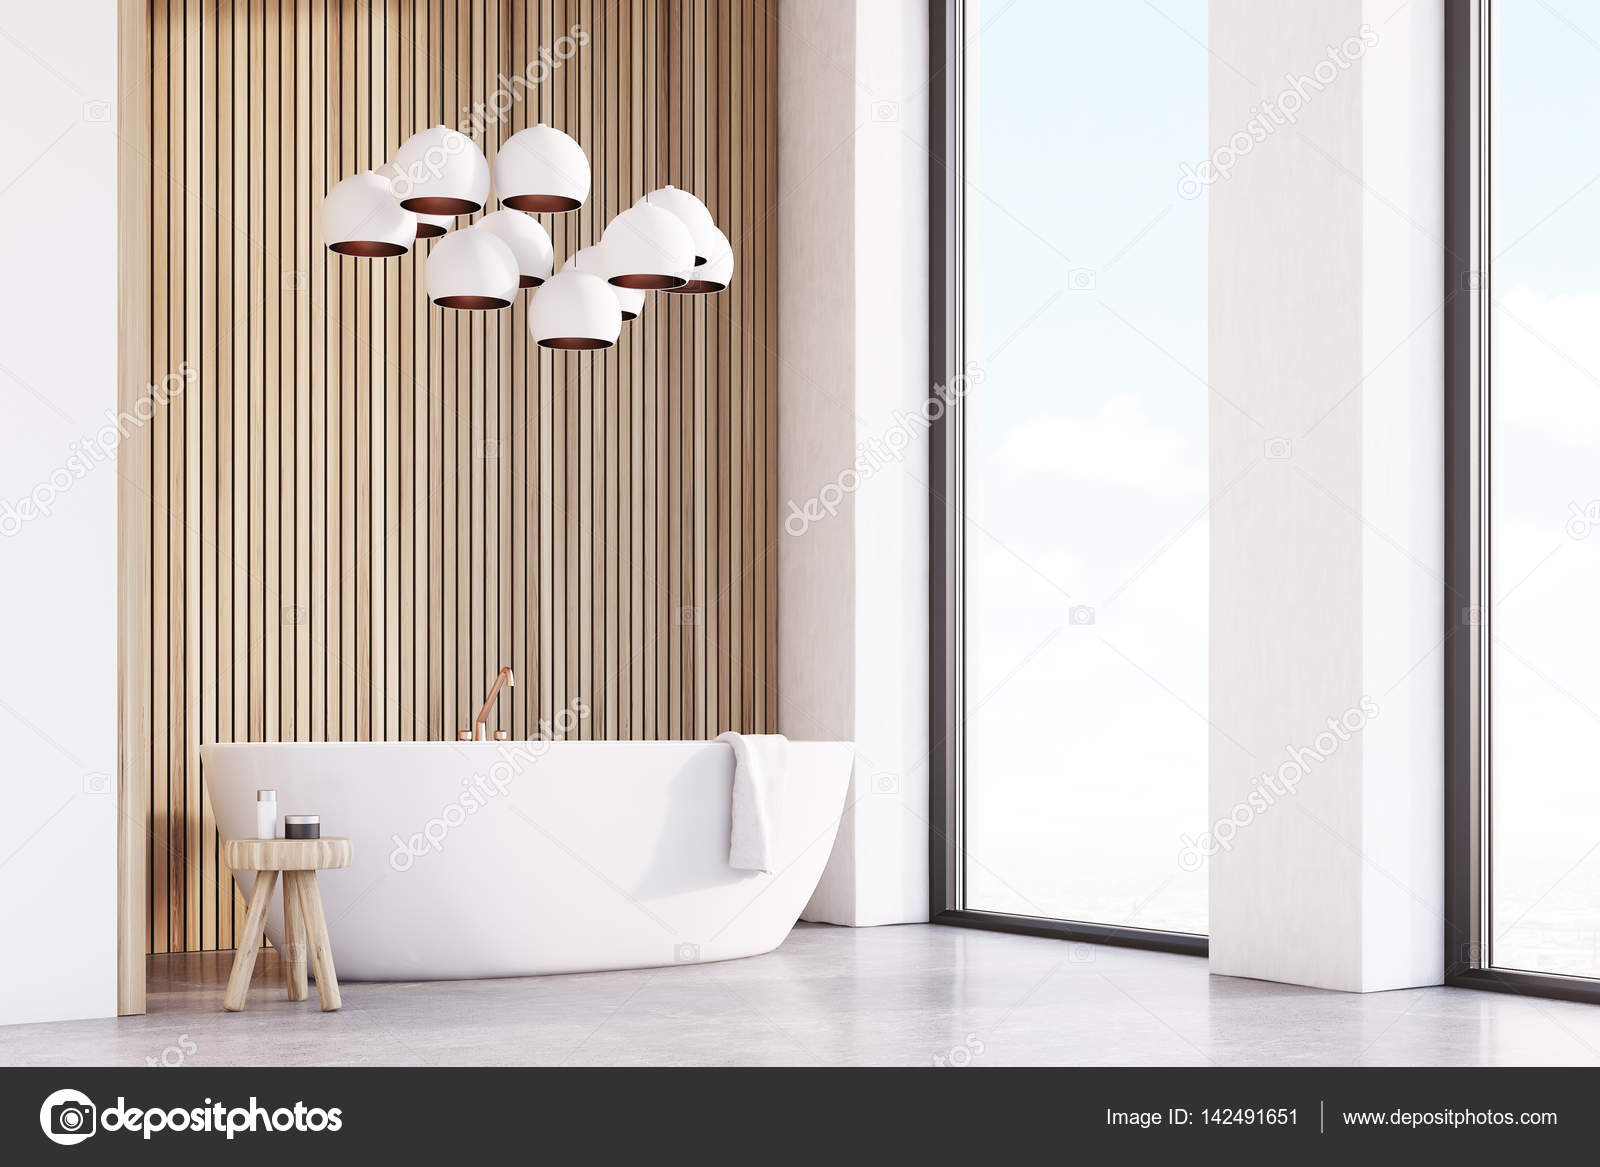 https://st3.depositphotos.com/2673929/14249/i/1600/depositphotos_142491651-stockafbeelding-badkamer-met-lampen-licht-hout.jpg